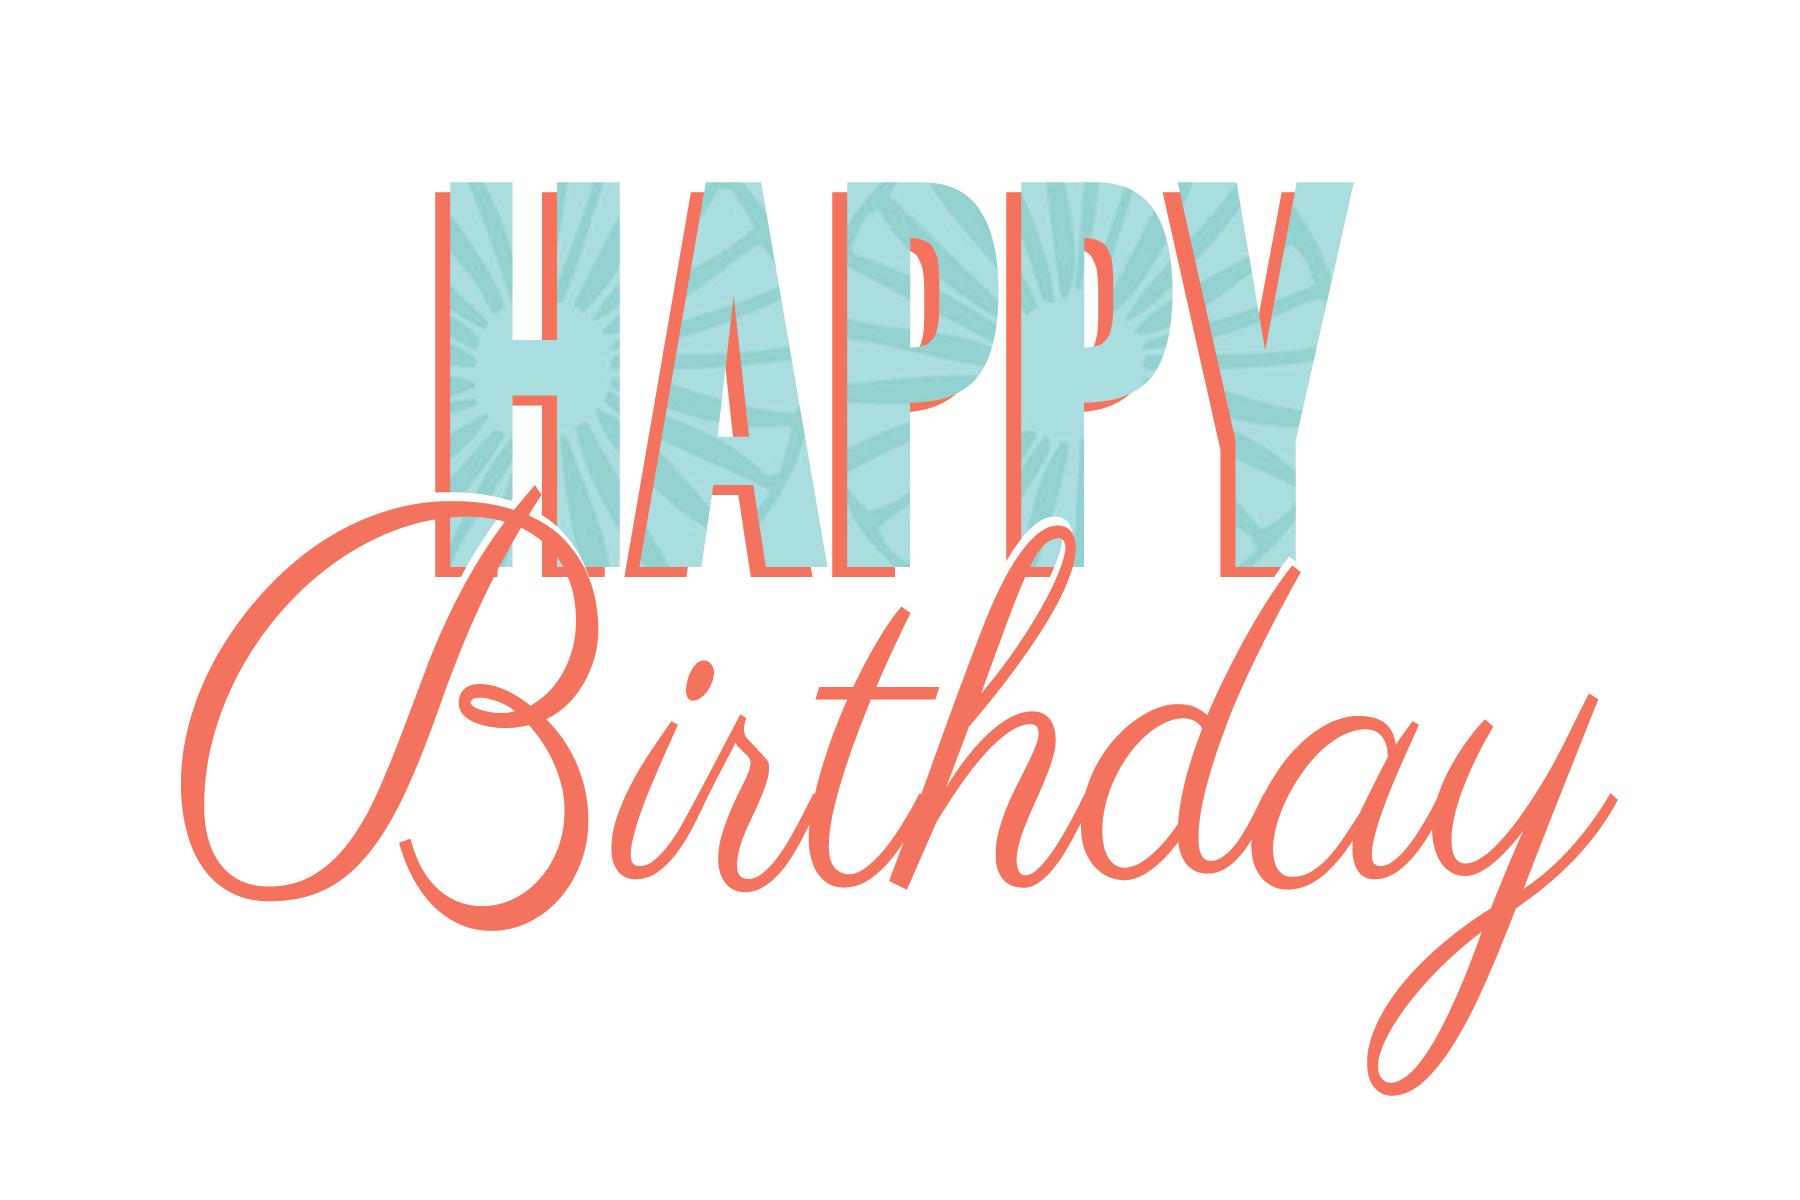 happy birthday images font - happy birthday images font - Wallpapers, hd-wallpapers, HD, Free, Birthday, 4k-wallpapers, 4k